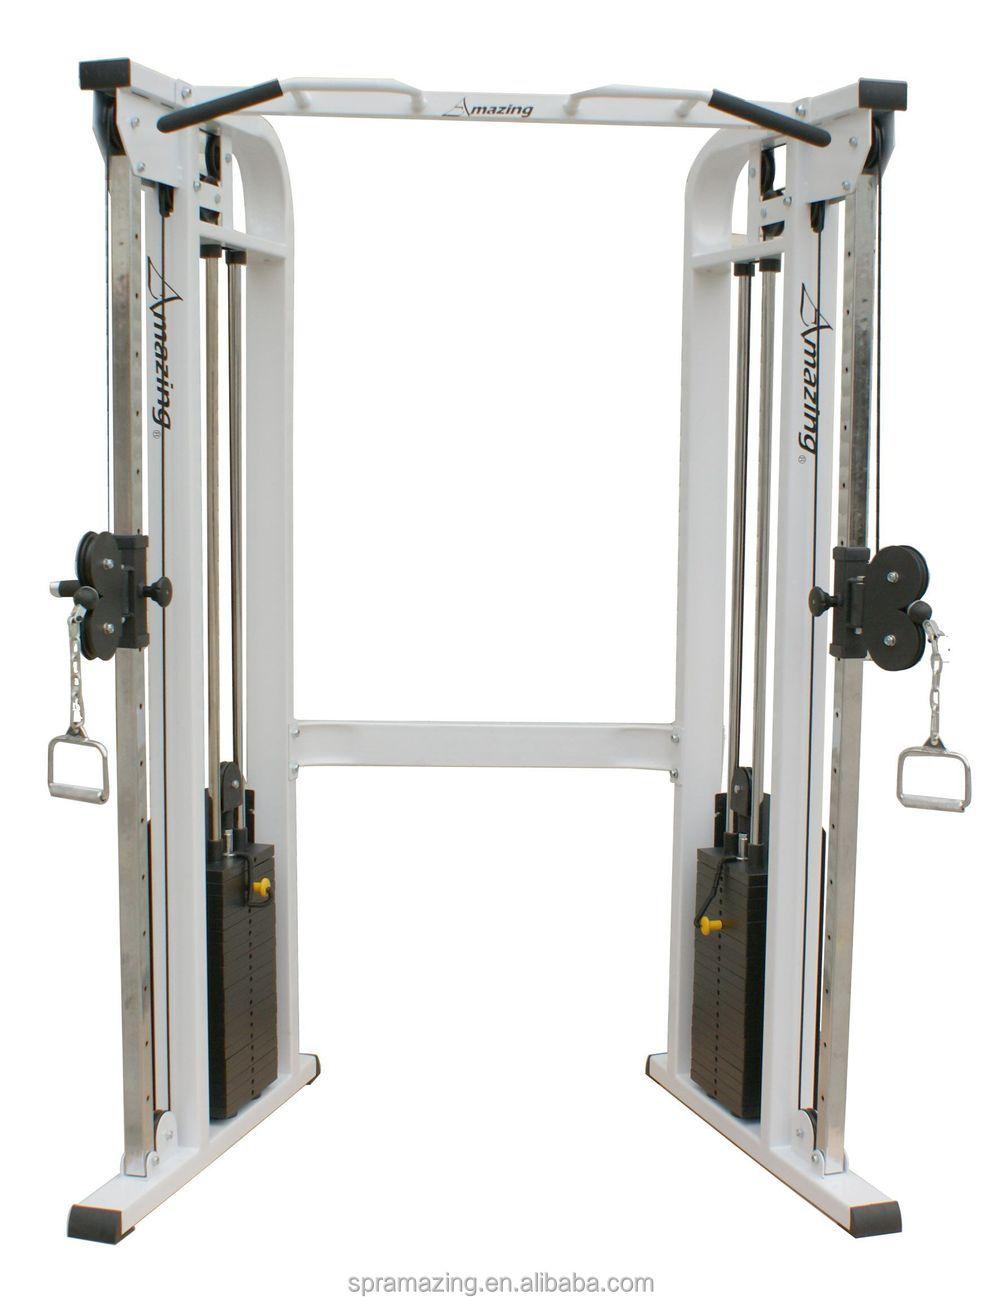 Yukon Cable Crossover Machine - amazon.com